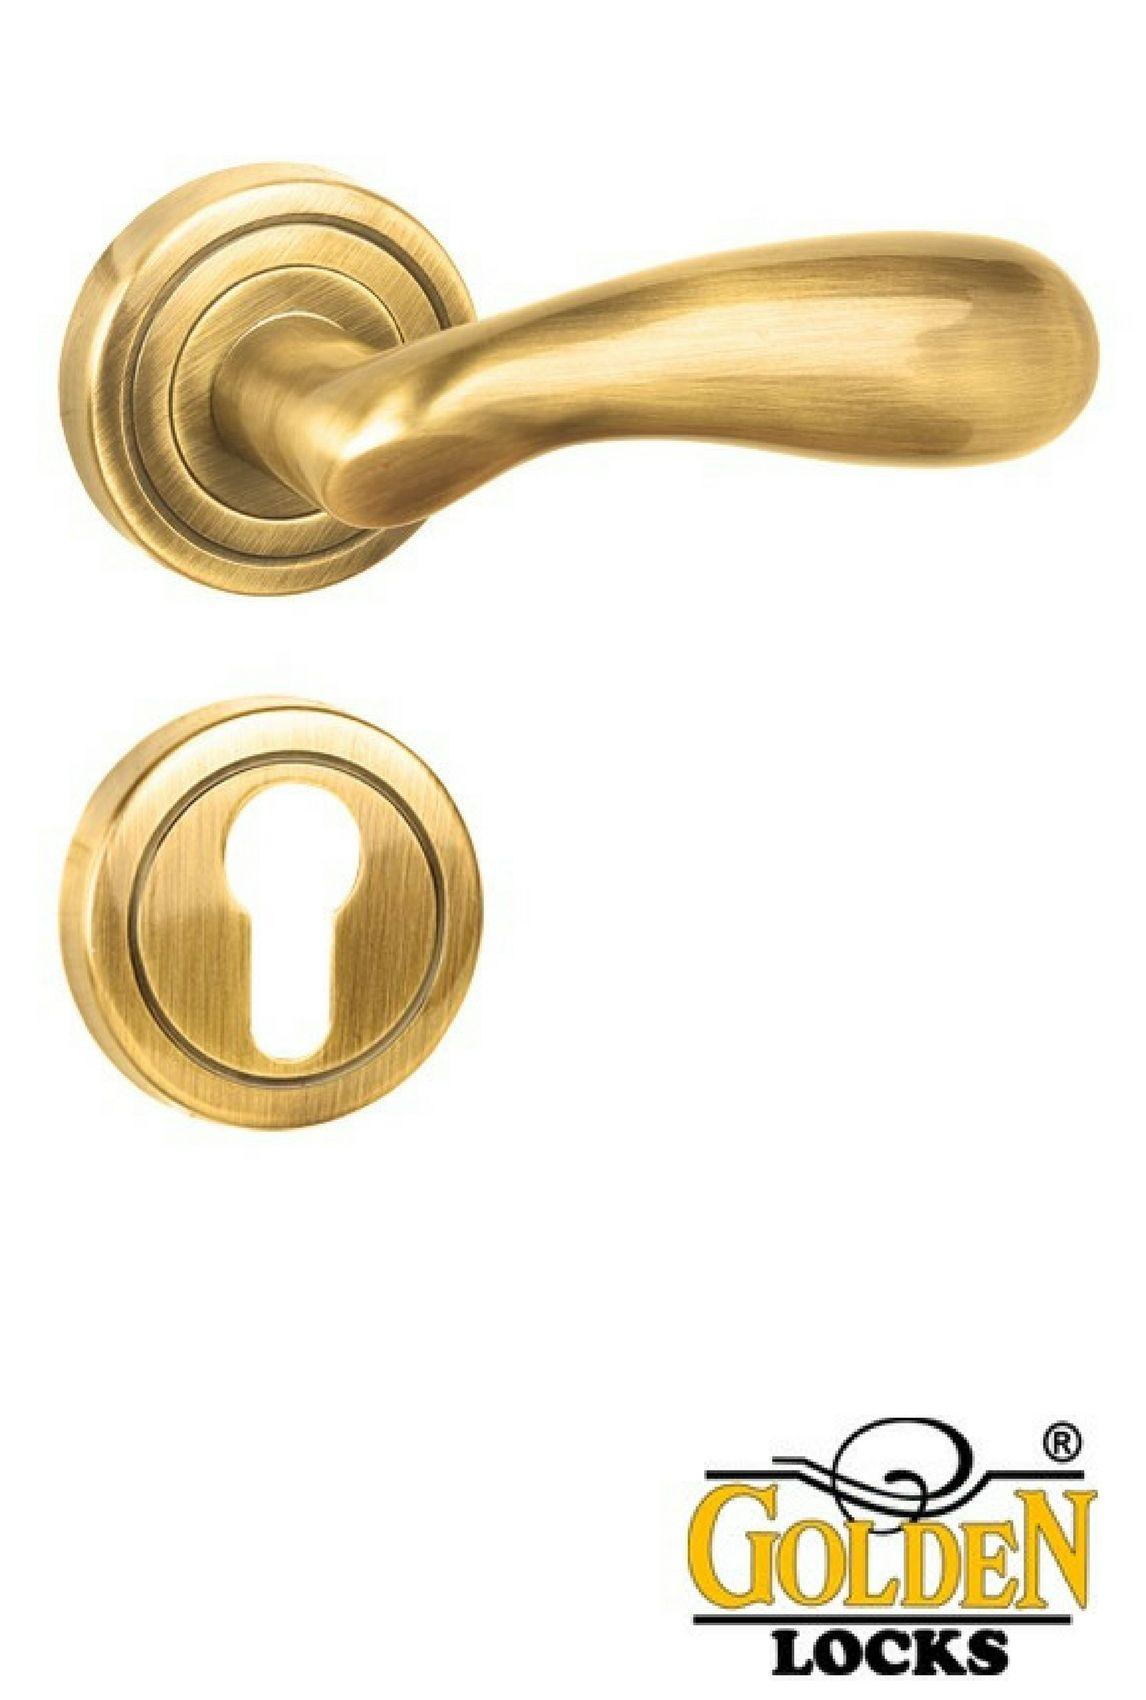 Goldenlocks.com - India - Geneva on Rose -Modern Cont&orary Lever Handles Luxurious Brass Door Handles Customised Antique Brass Lever Handles ...  sc 1 st  Pinterest & Goldenlocks.com - India - Geneva on Rose -Modern Contamporary Lever ...